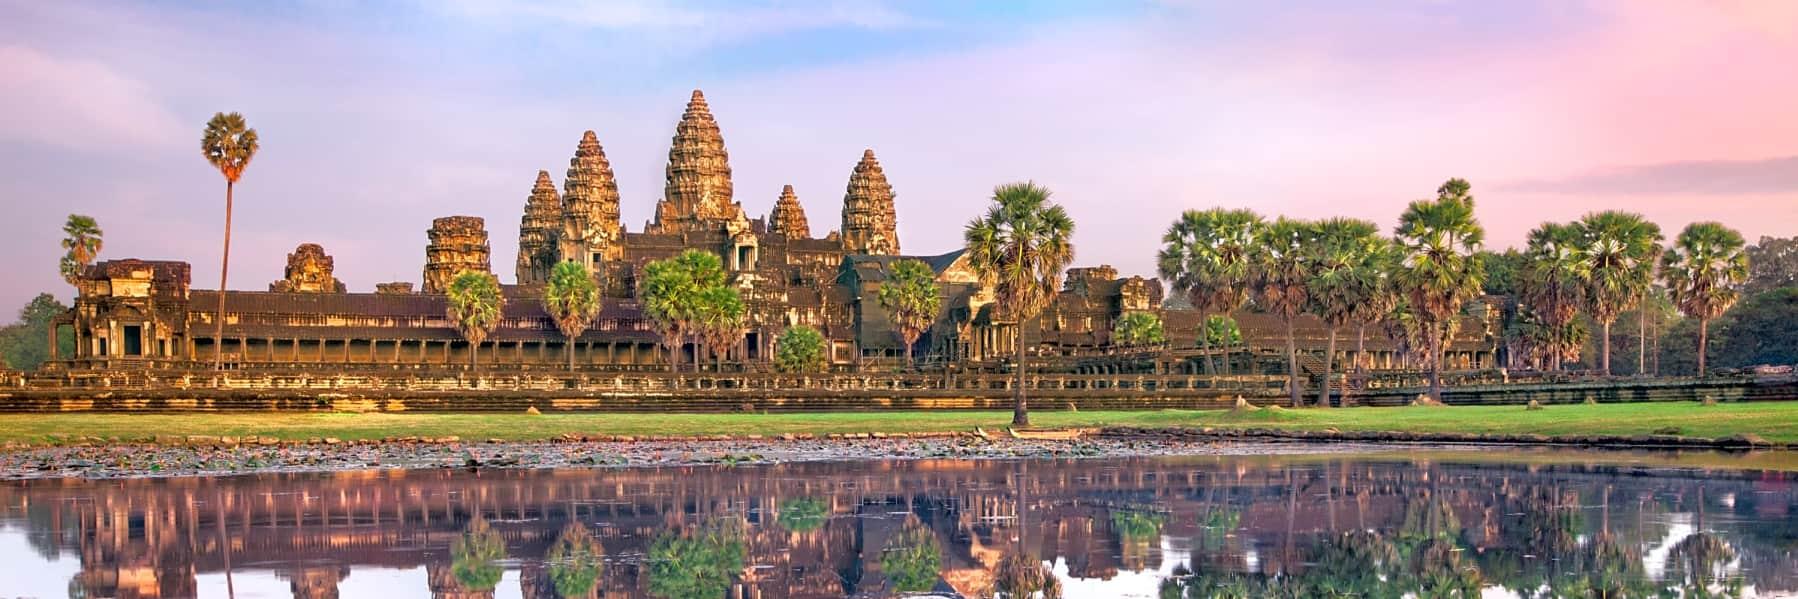 Angkor Wat Sunrise & Angkor Thom Tour (Siem Reap) – Morning gallery